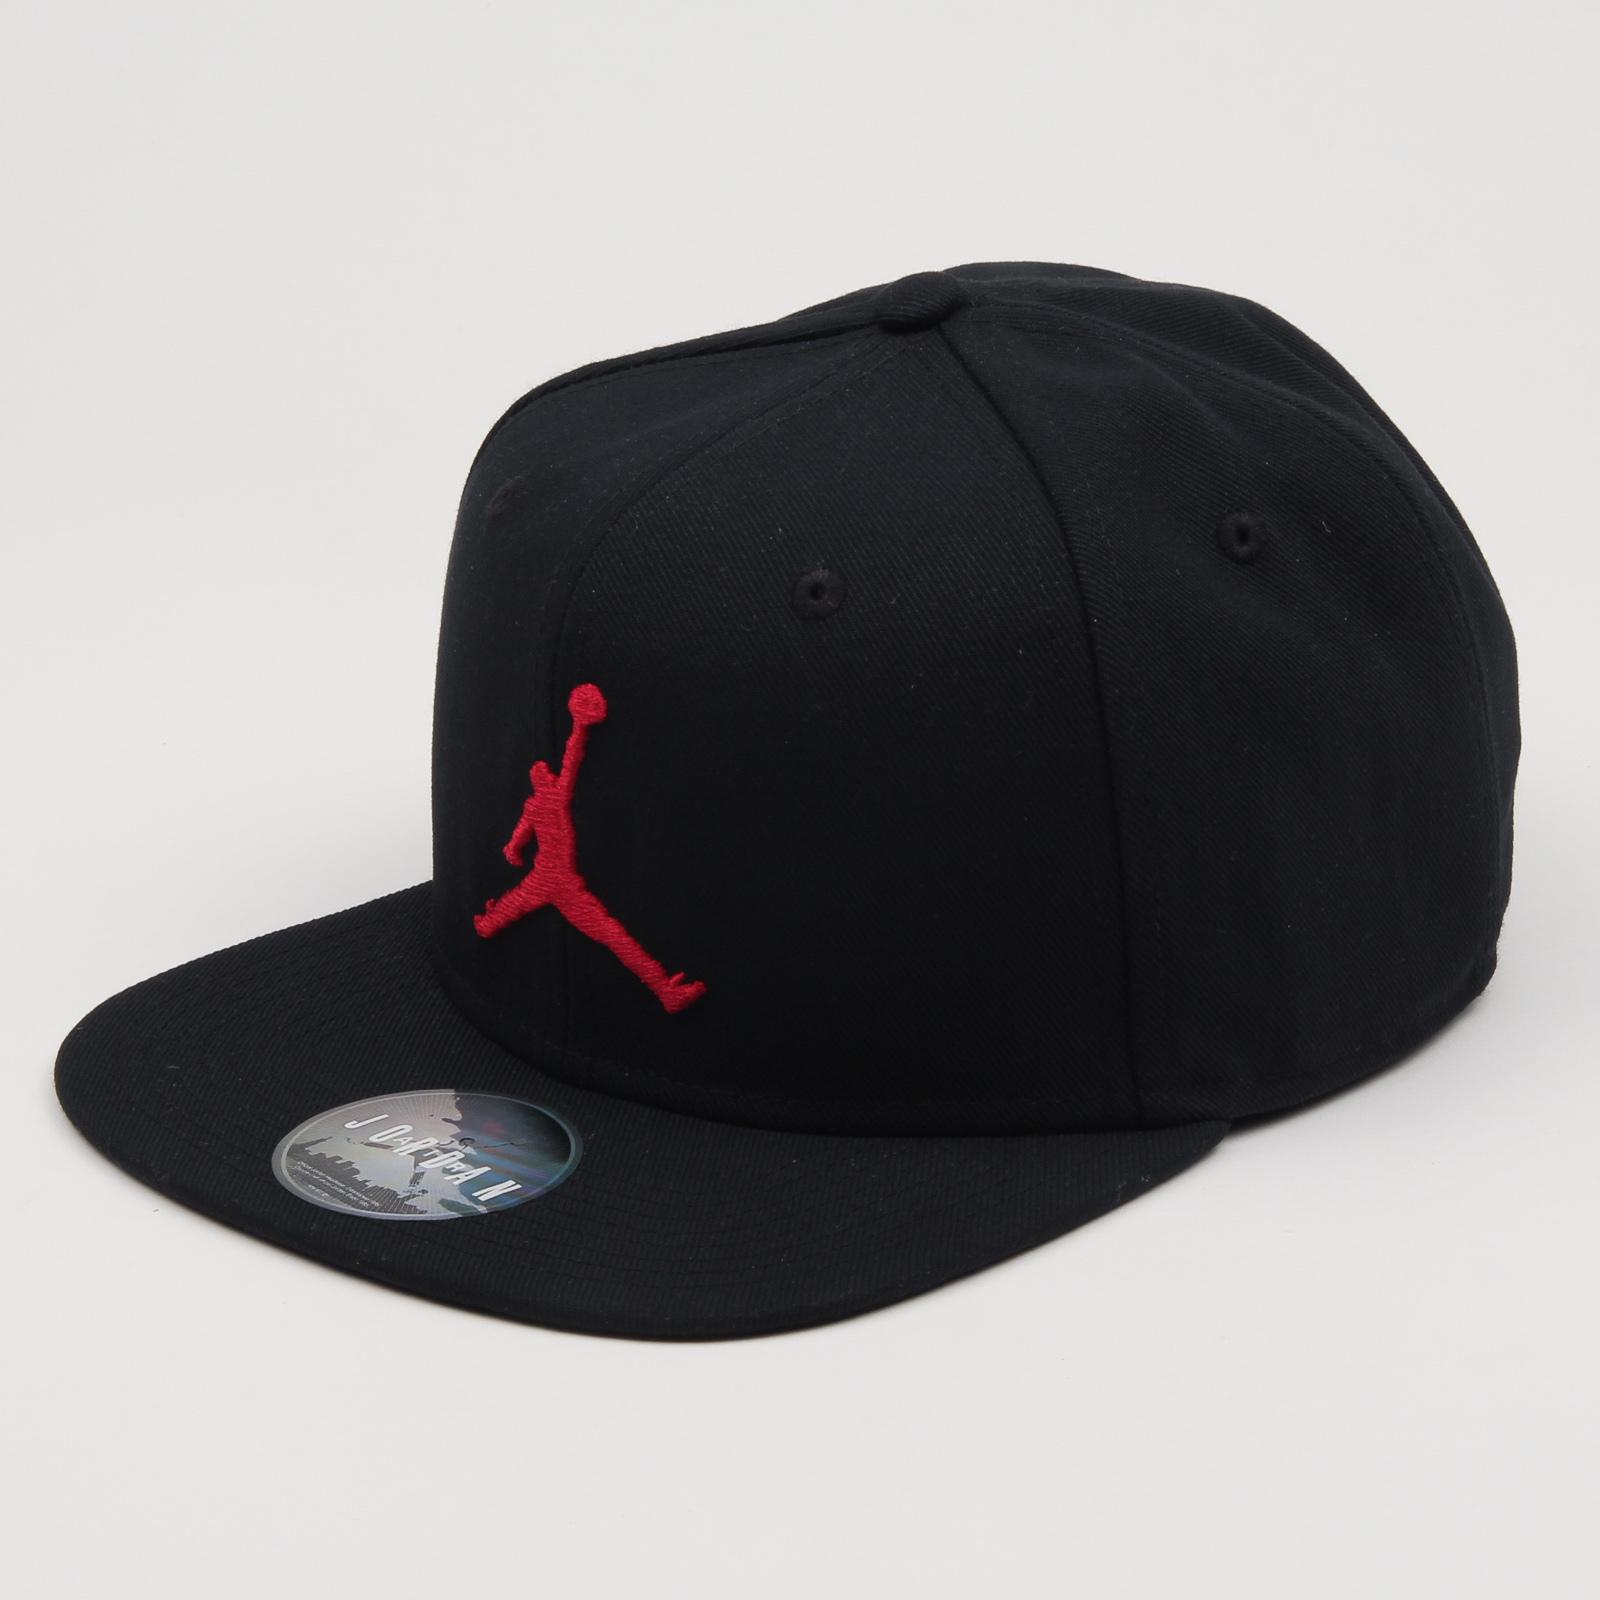 09b25b2c3 Jordan Pro Jumpman Snapback čierna / červená - Glami.sk